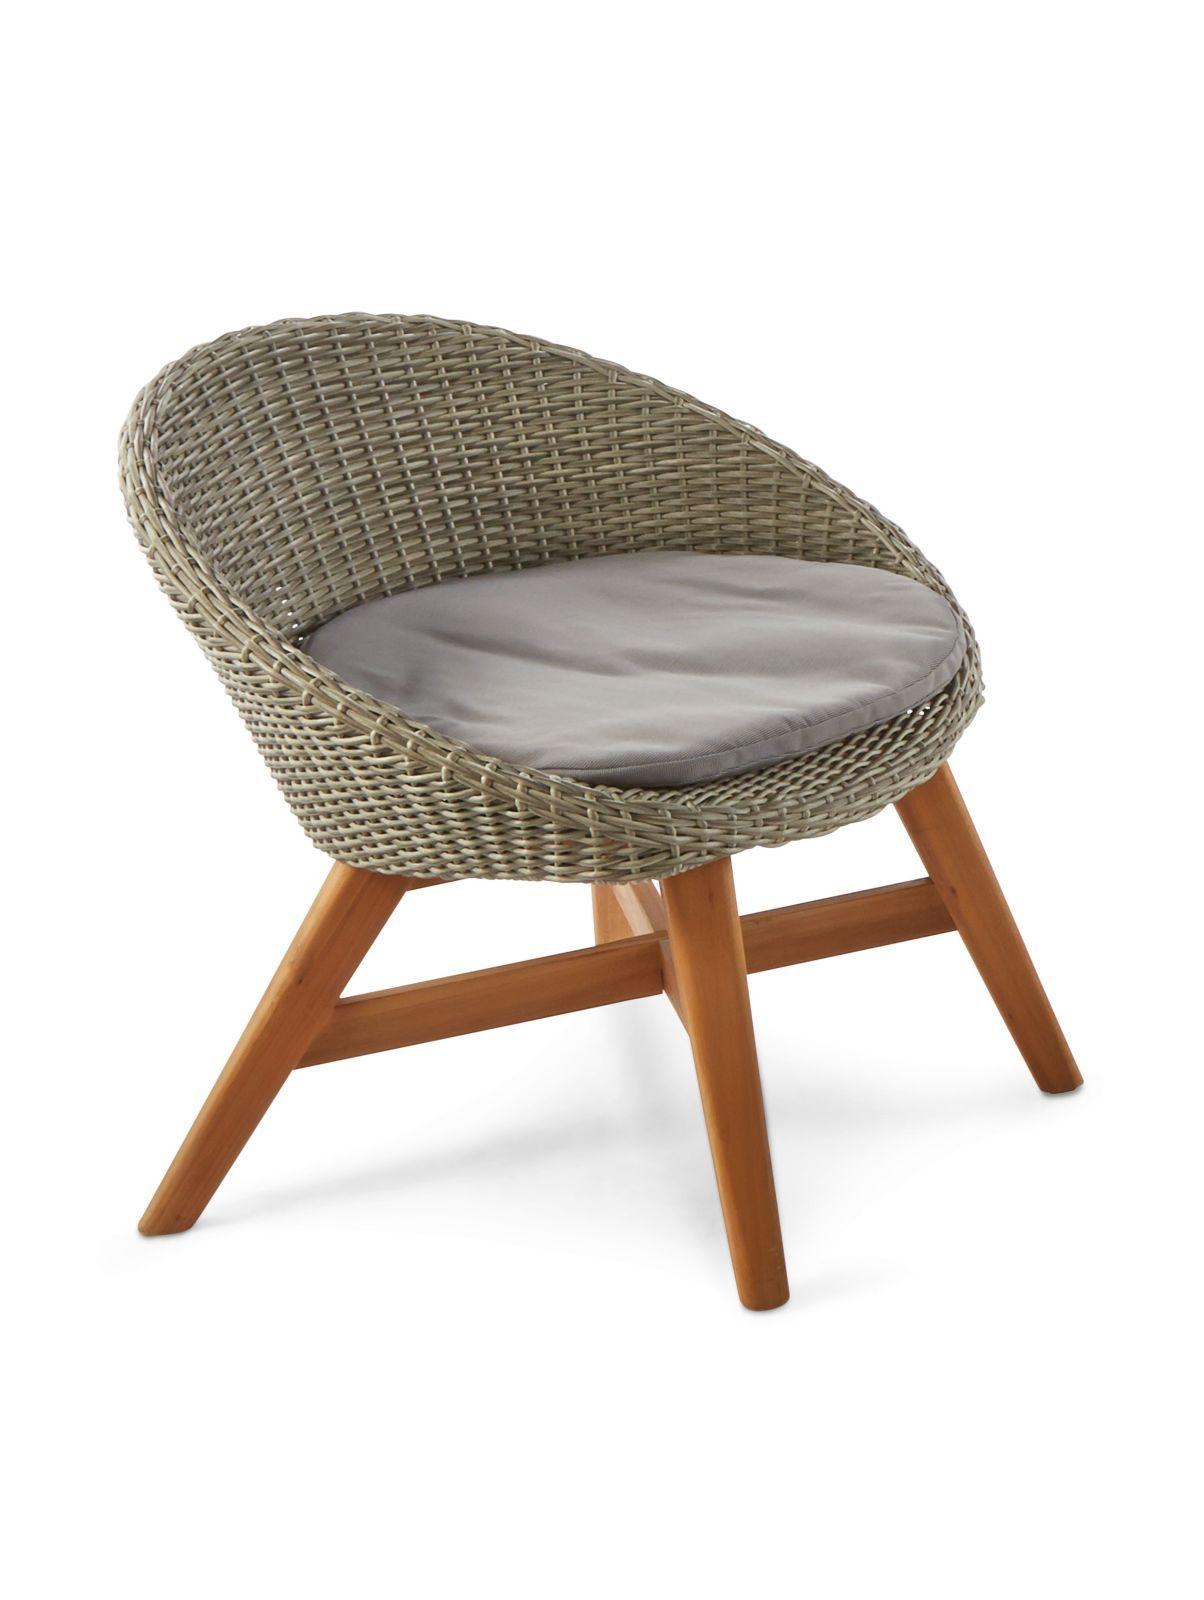 Gartenstuhl Forteleza Modern Chair Decor Home Decor